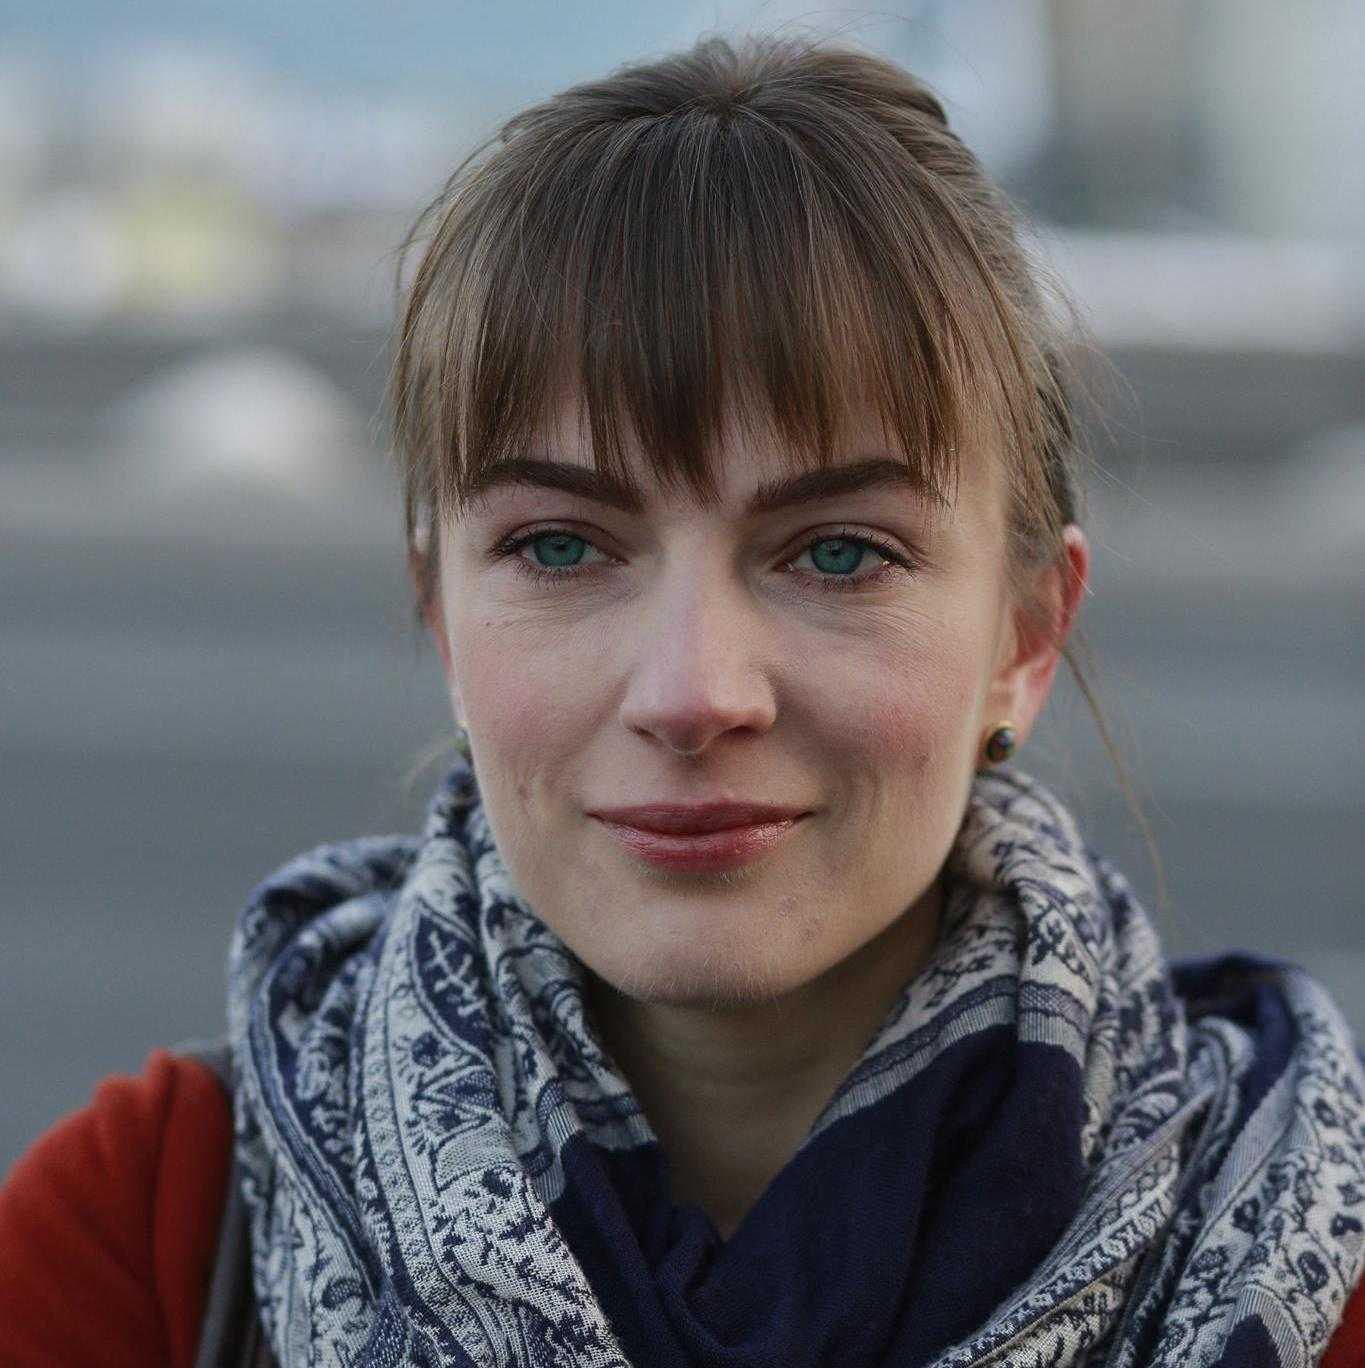 Olexandra Matviychuk